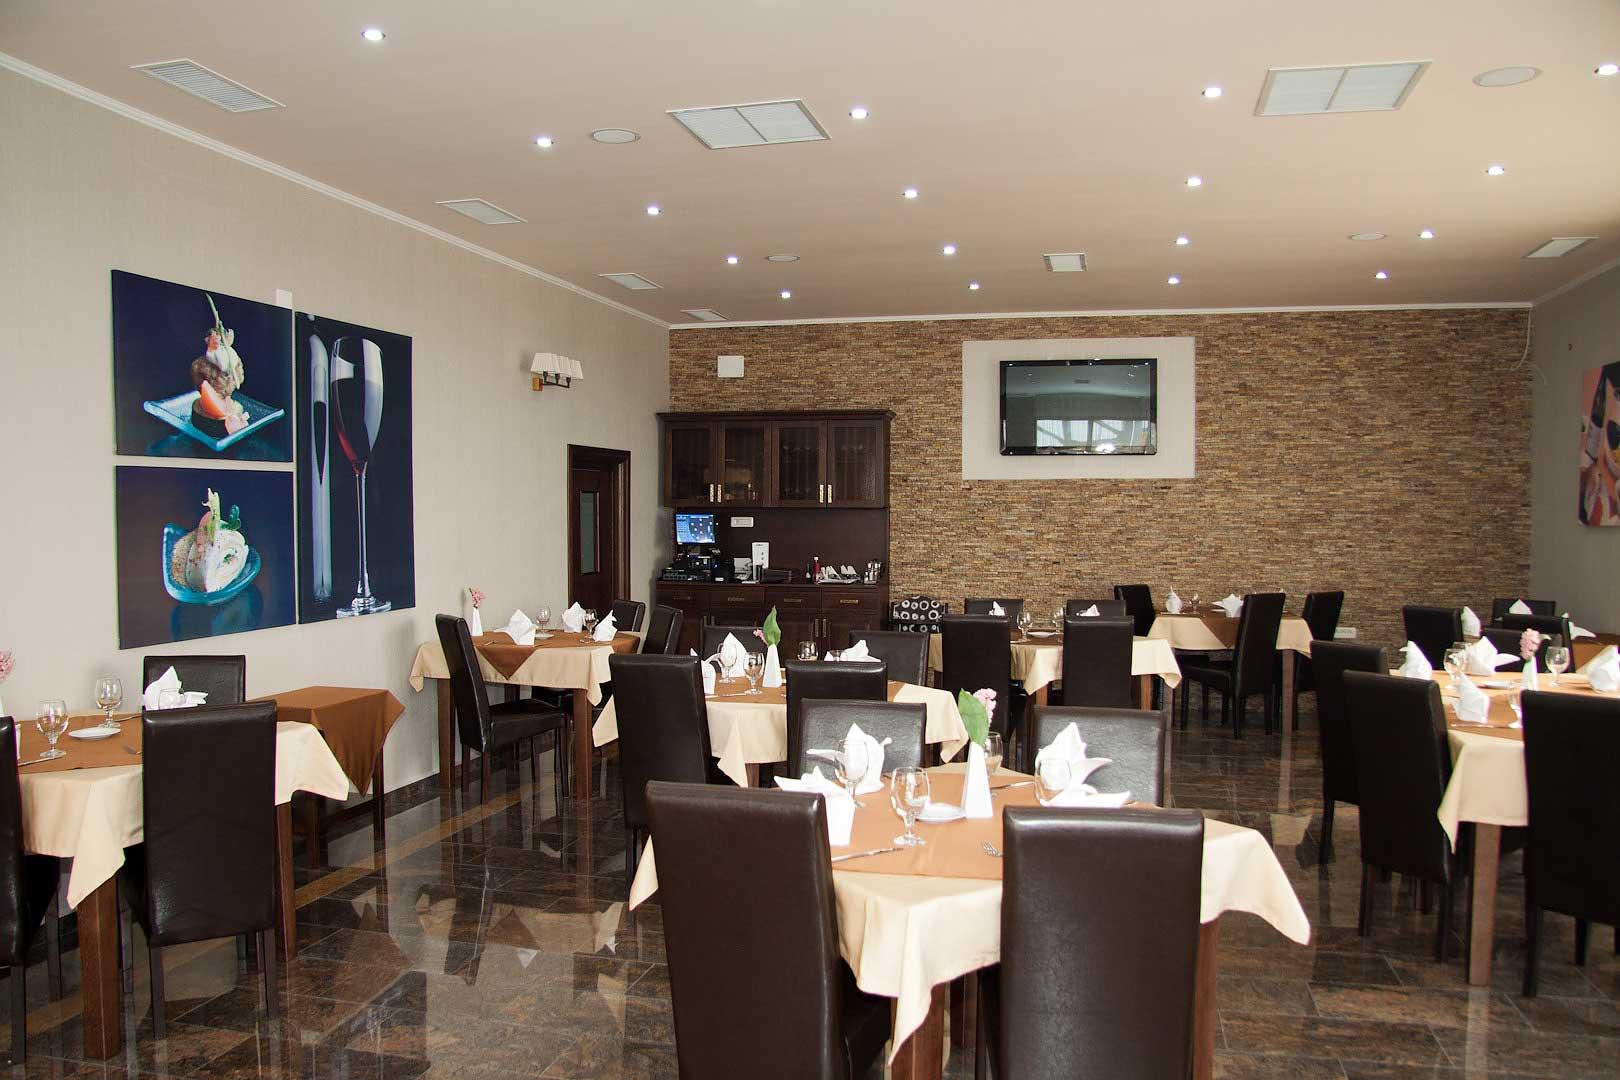 nqixv_hotel-han-restaurant-2.jpg